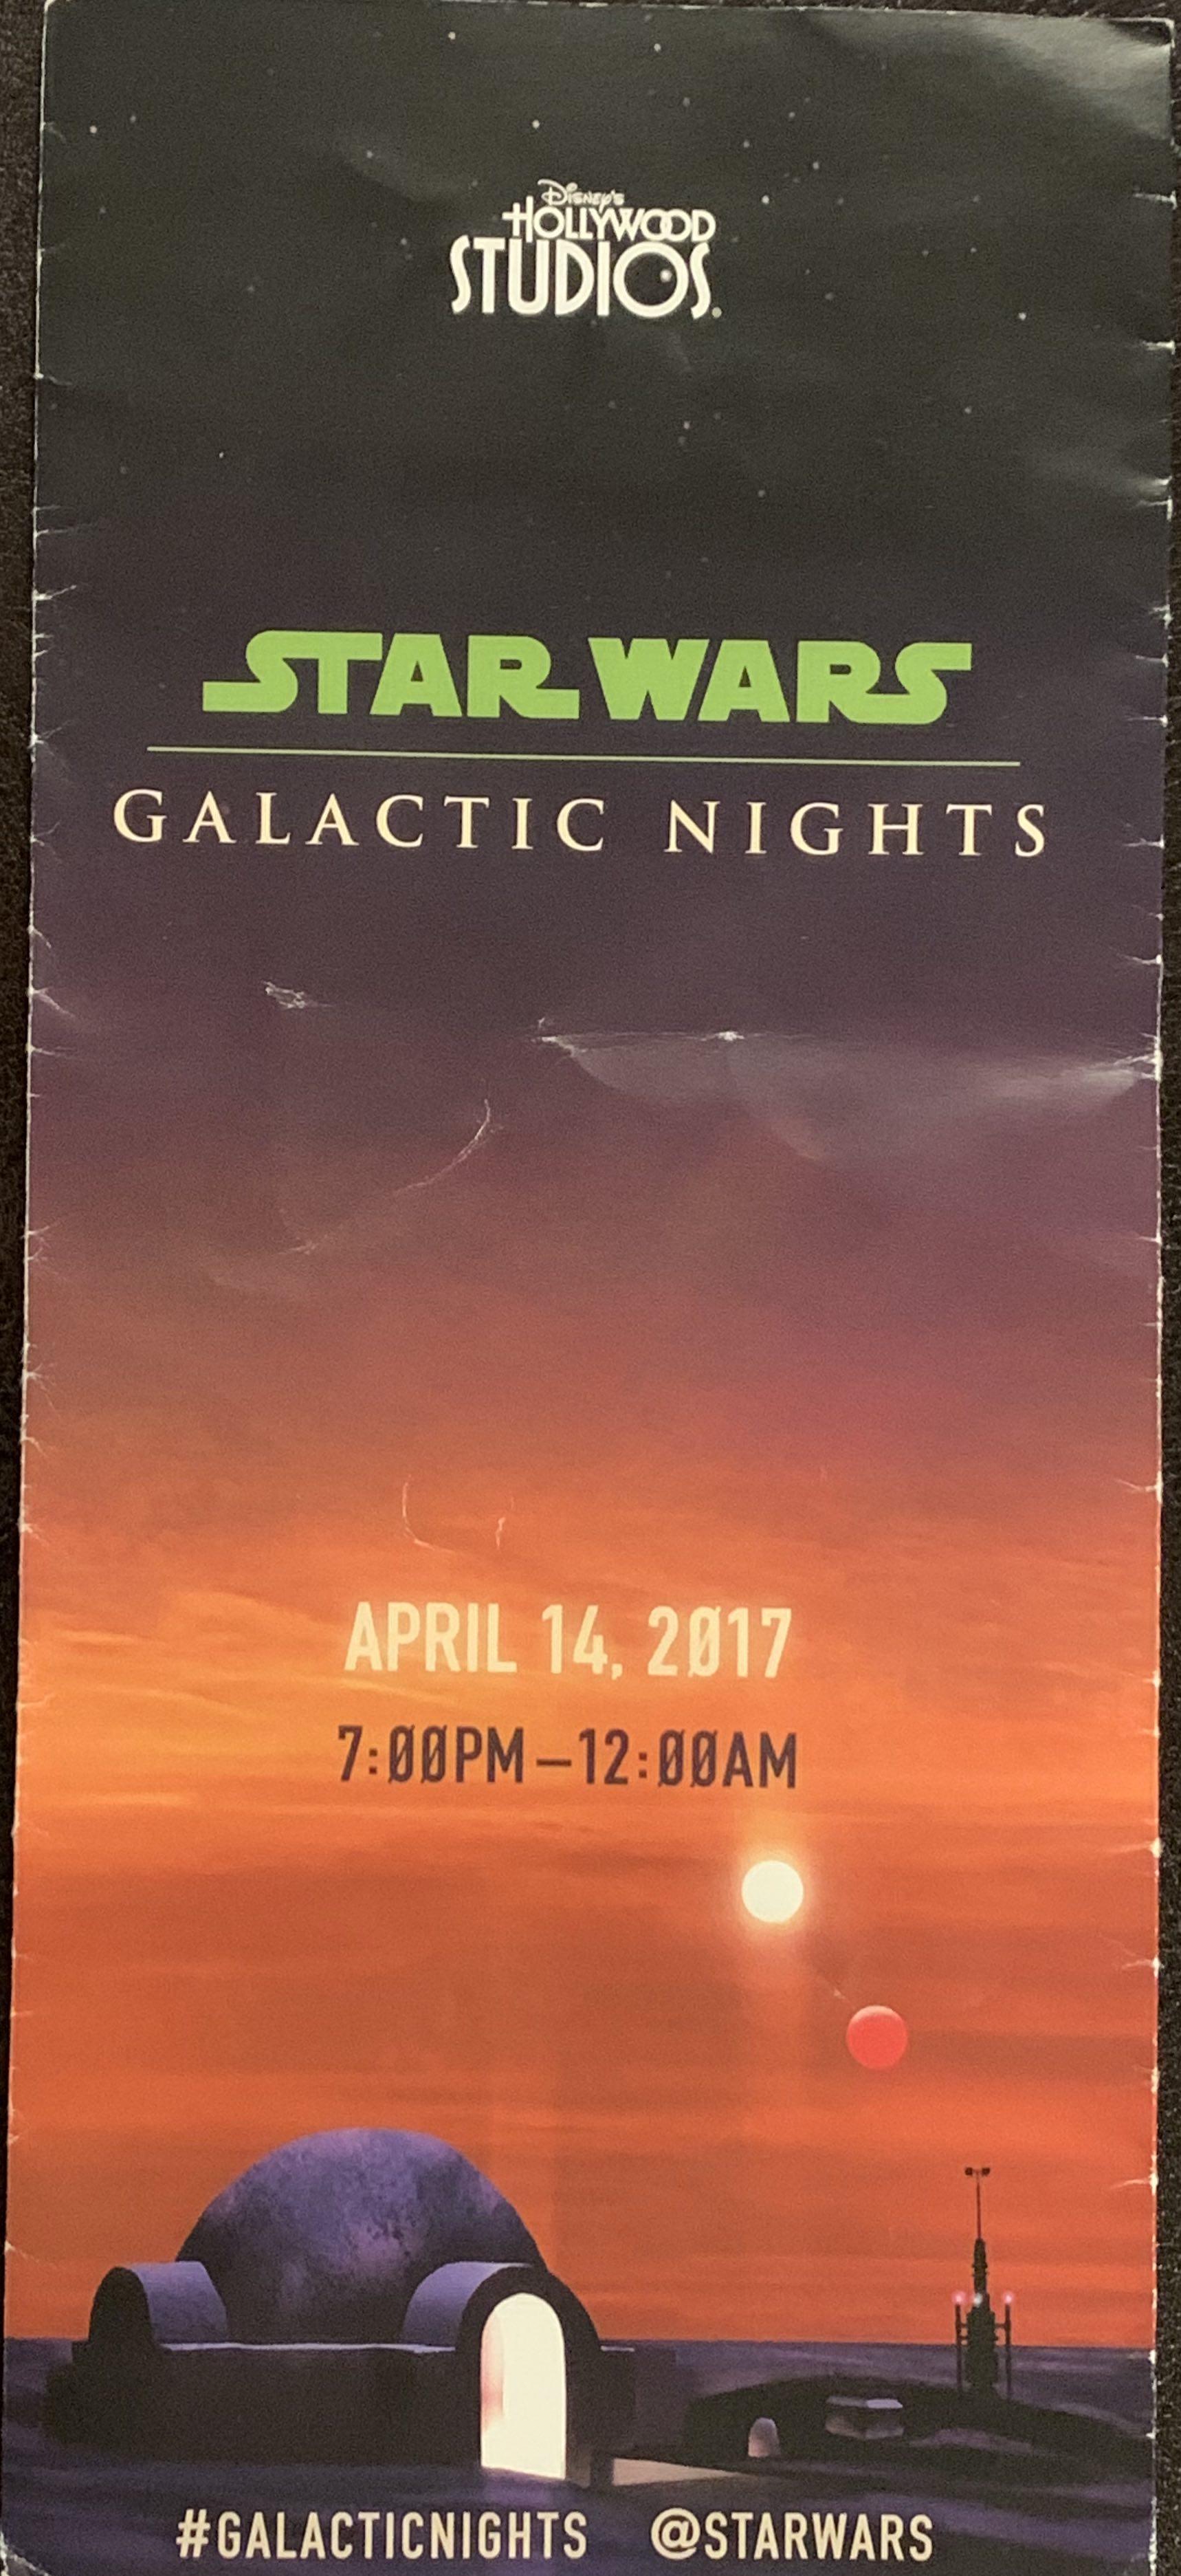 Star Wars Galactic Nights Orlando 2017 Program Guide